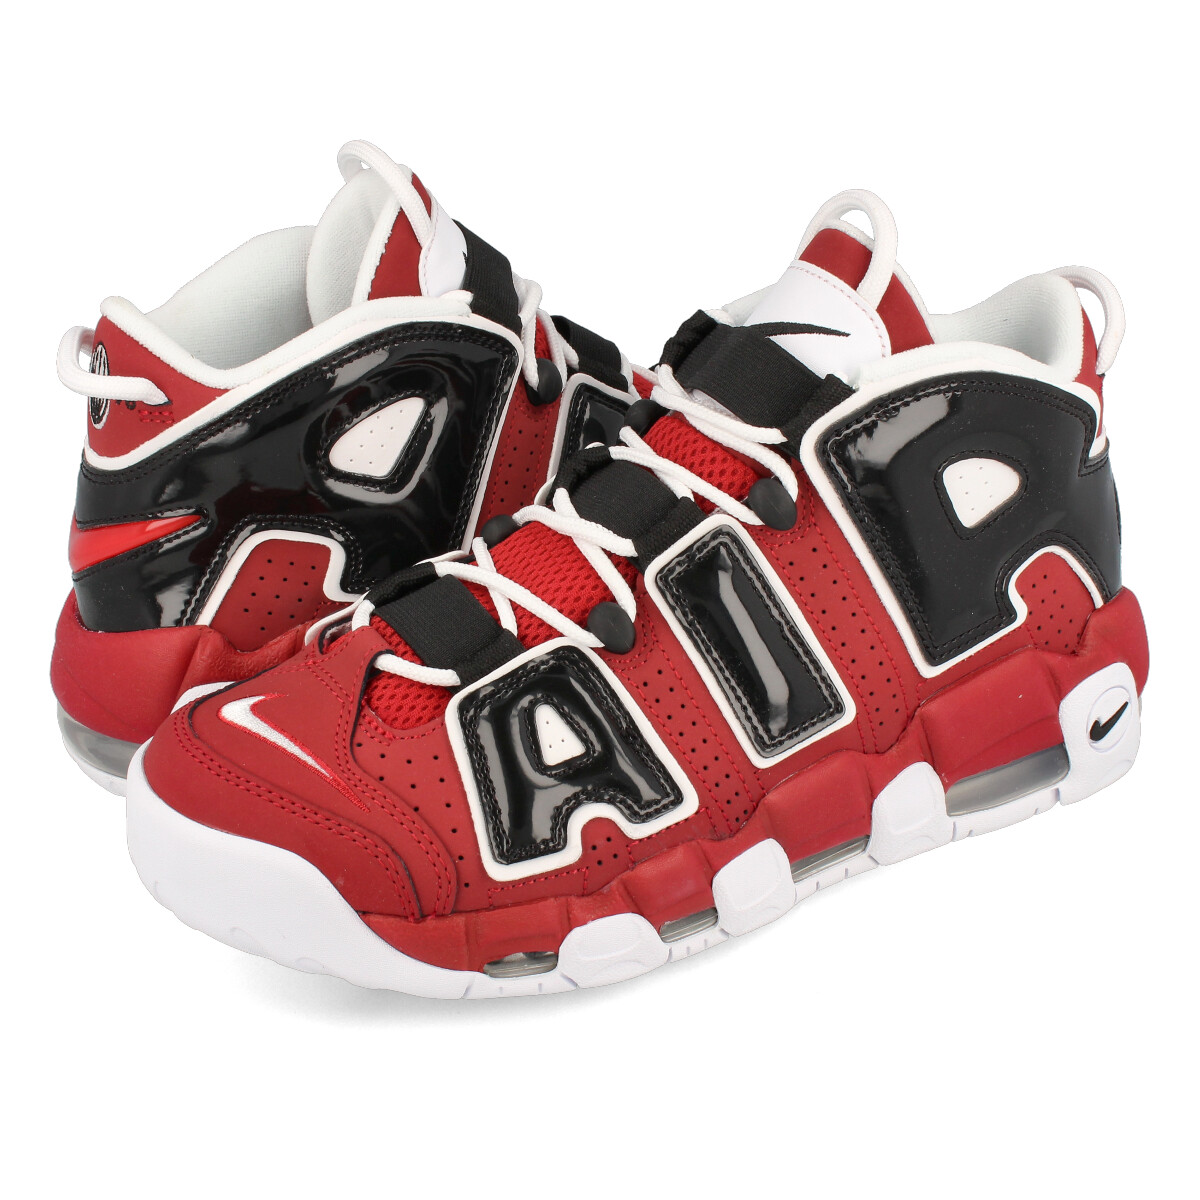 buy popular 00ffa 322dc NIKE AIR MORE UPTEMPO 96 Nike more up tempo 96 VARSITY RED WHITE BLACK ...